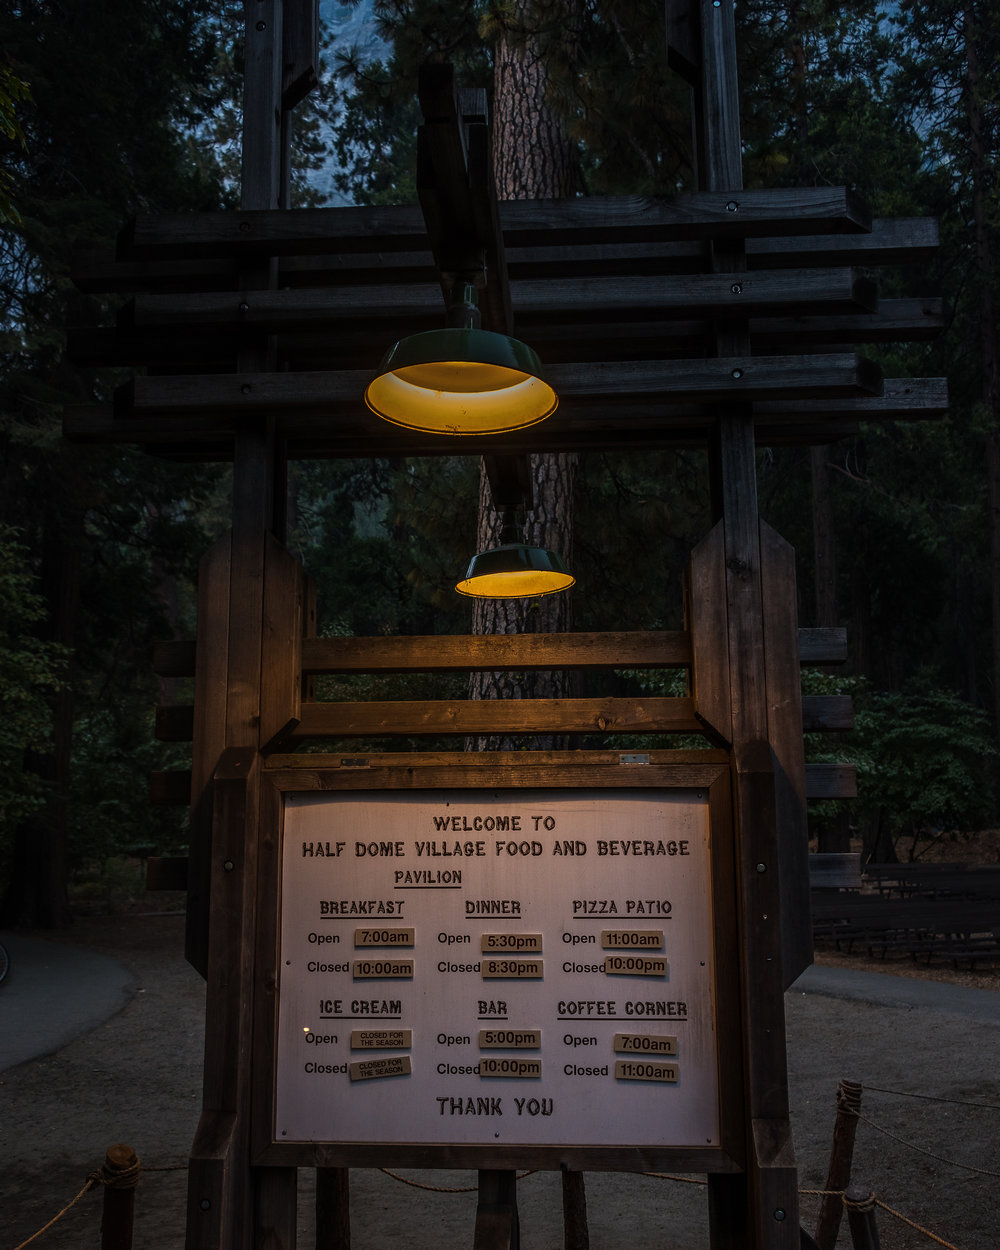 NAPA-Yosemite-27.jpg